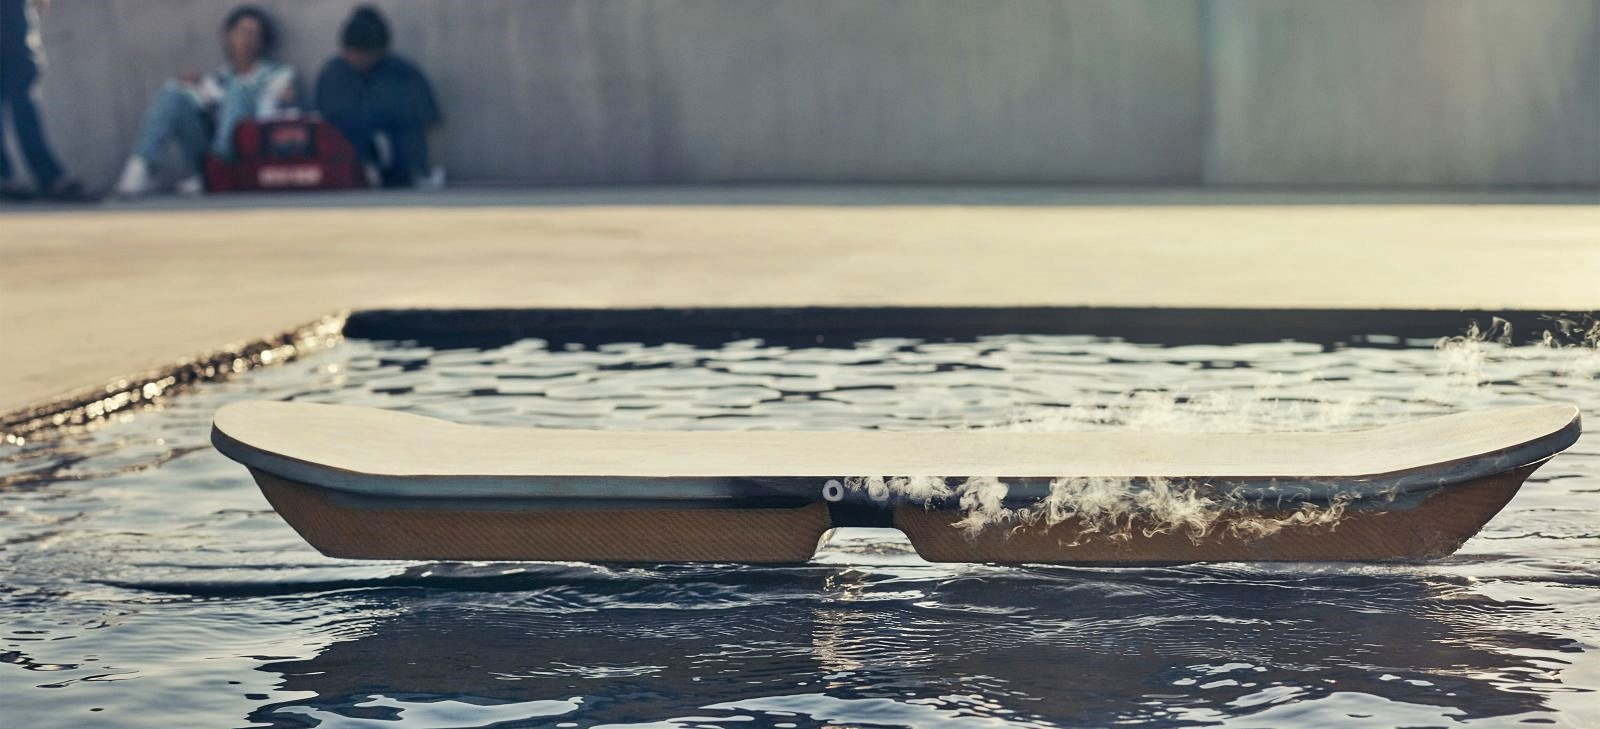 hoverboard-lexus-hoverboard-3